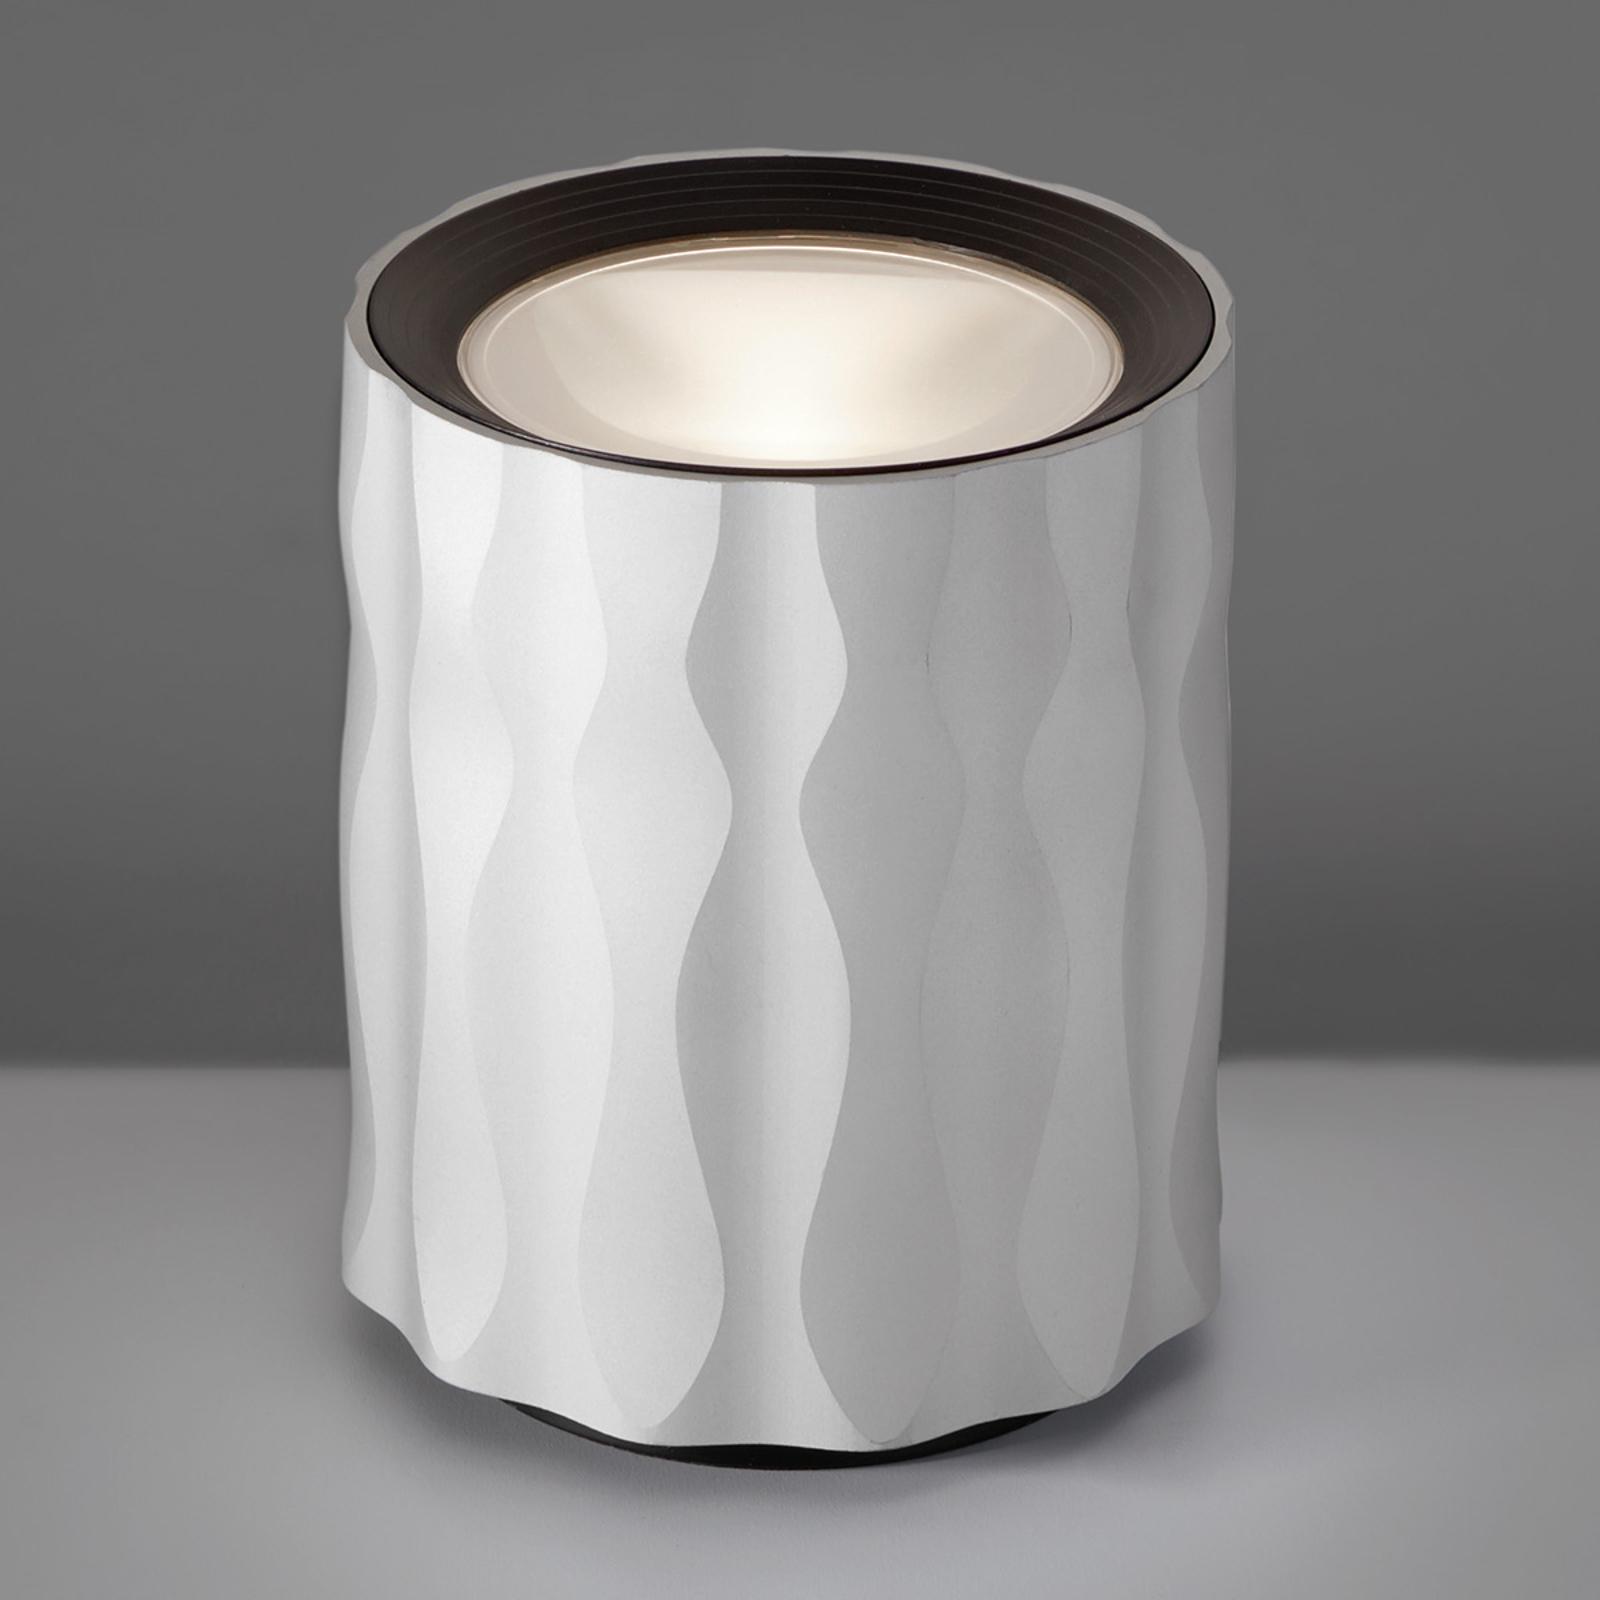 Artemide Fiamma 15 bord- og gulvlampe grå